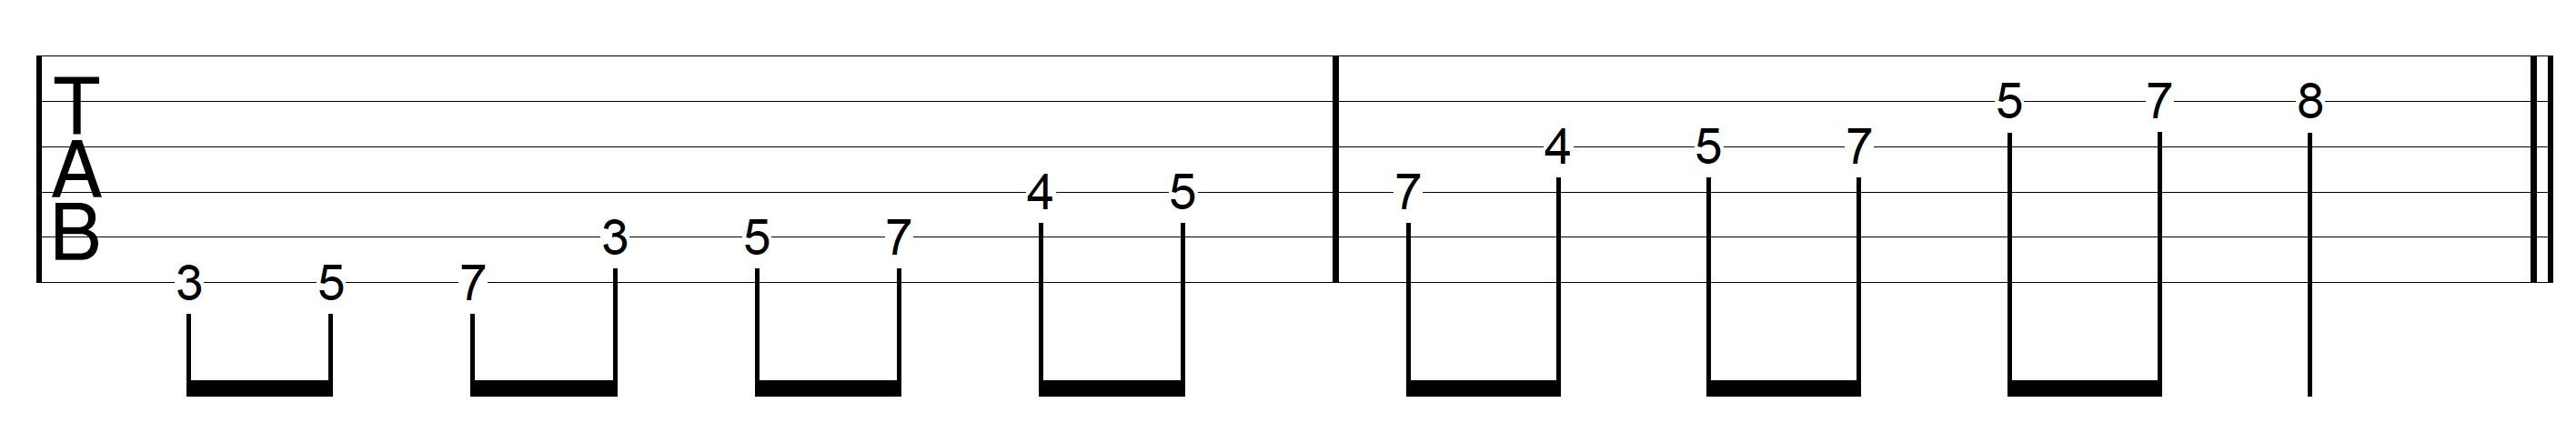 Open String Scale G Major Ascending Fretted